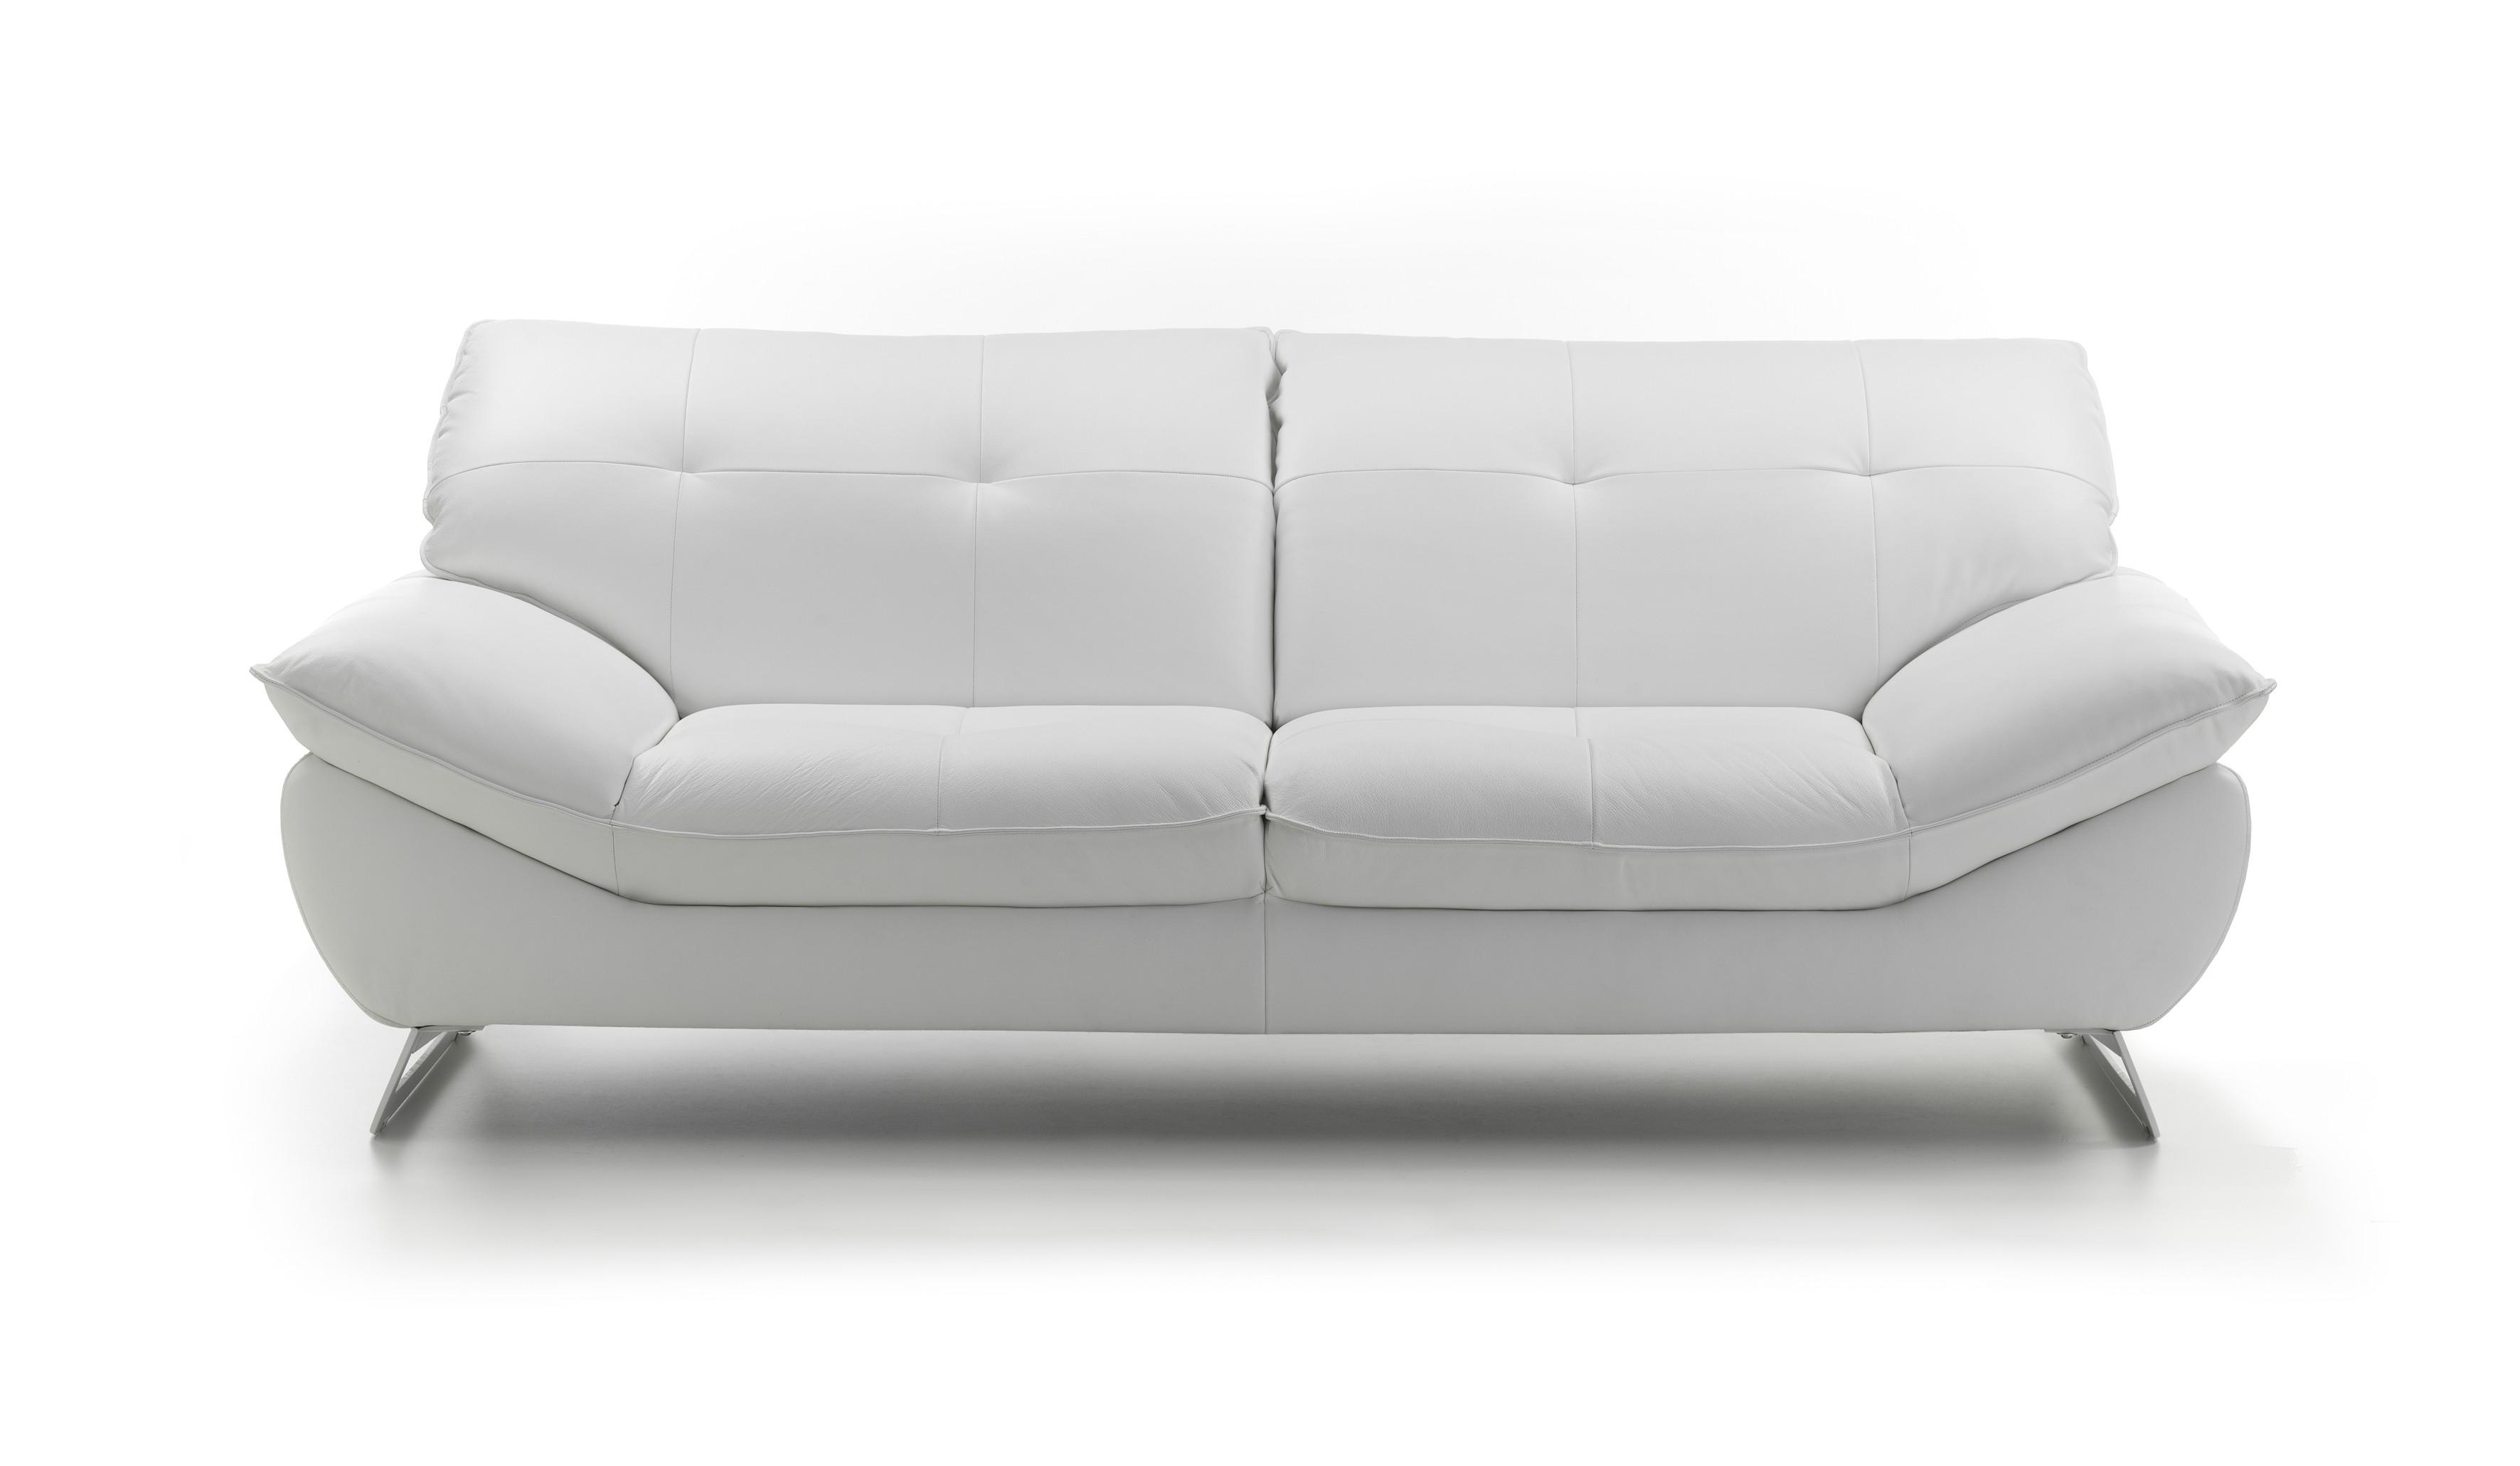 belgian shelter arm sofa companies in bangalore belgium leather sofas taraba home review